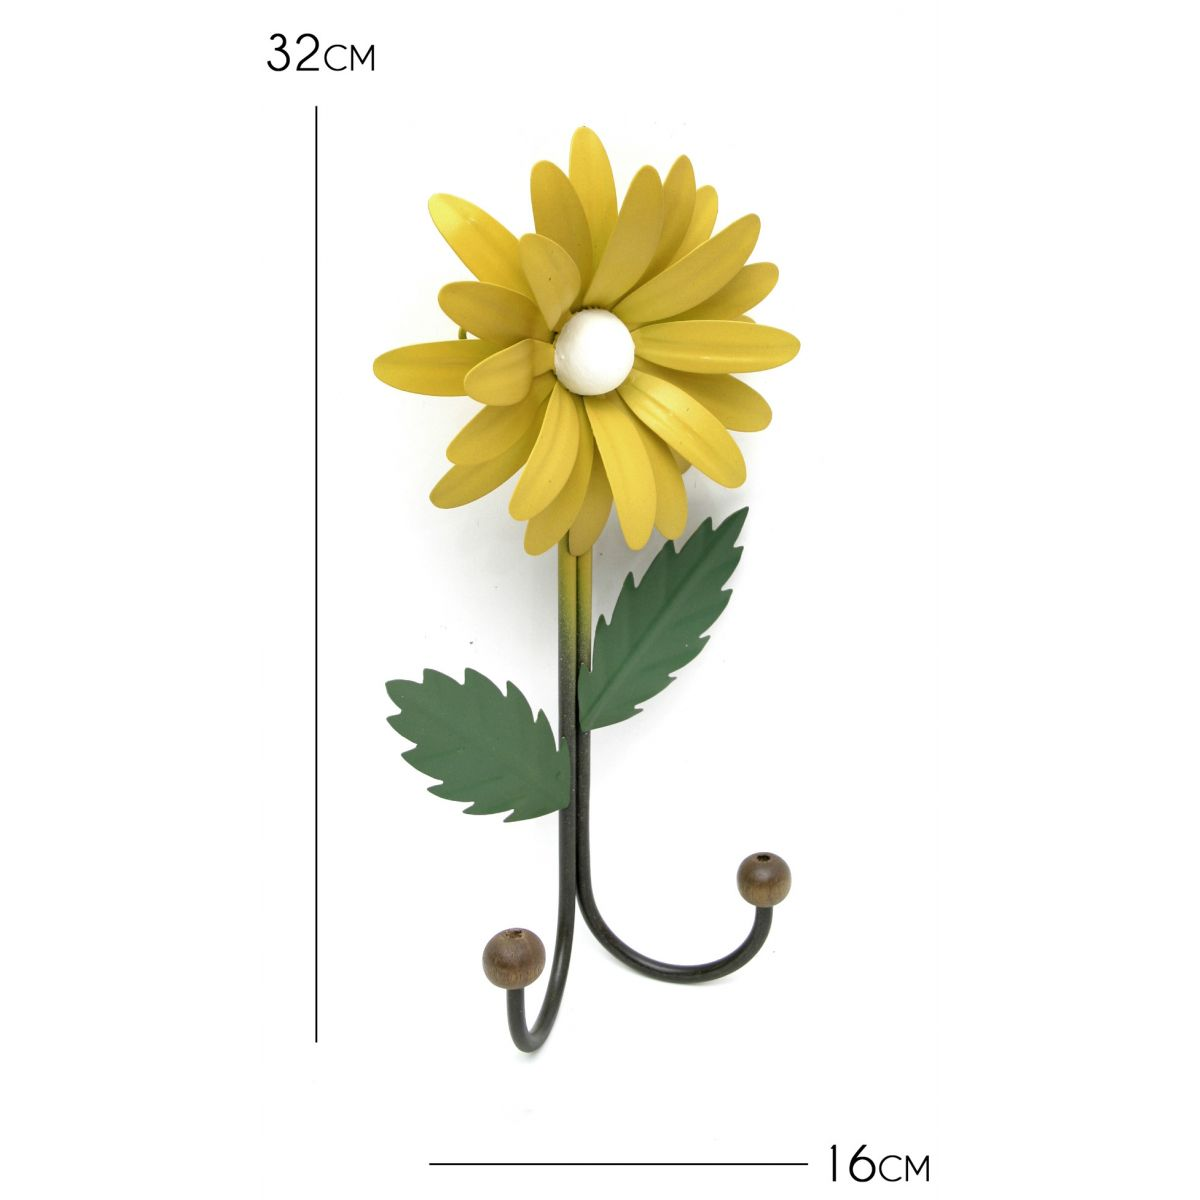 Cabide de Ferro para Bolsas Ganchos de Flor Rústico Artesanal